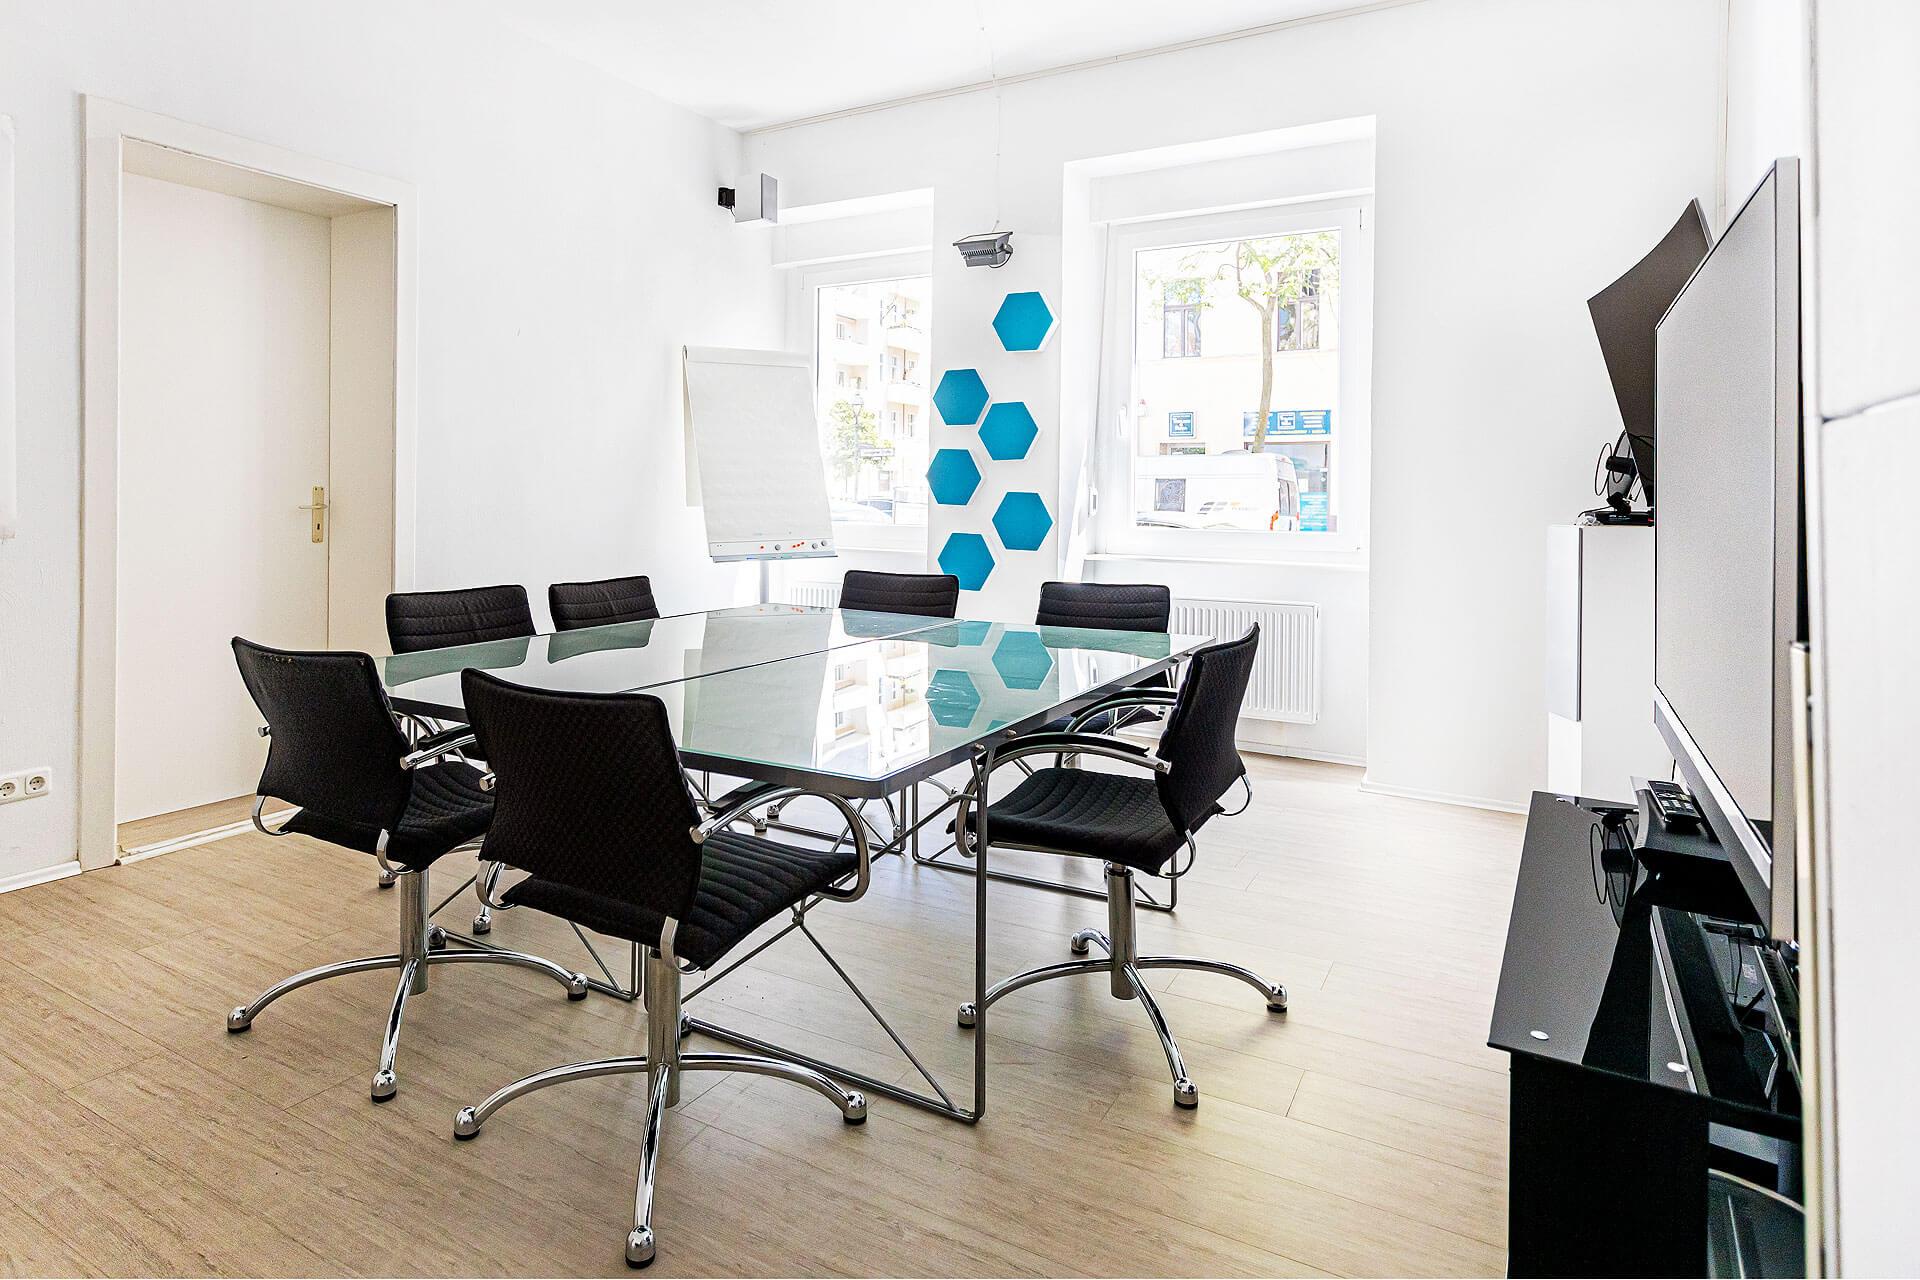 Besprechungsraum-coworking-berlin-charlottenburg-personal-branding-foto-Tage